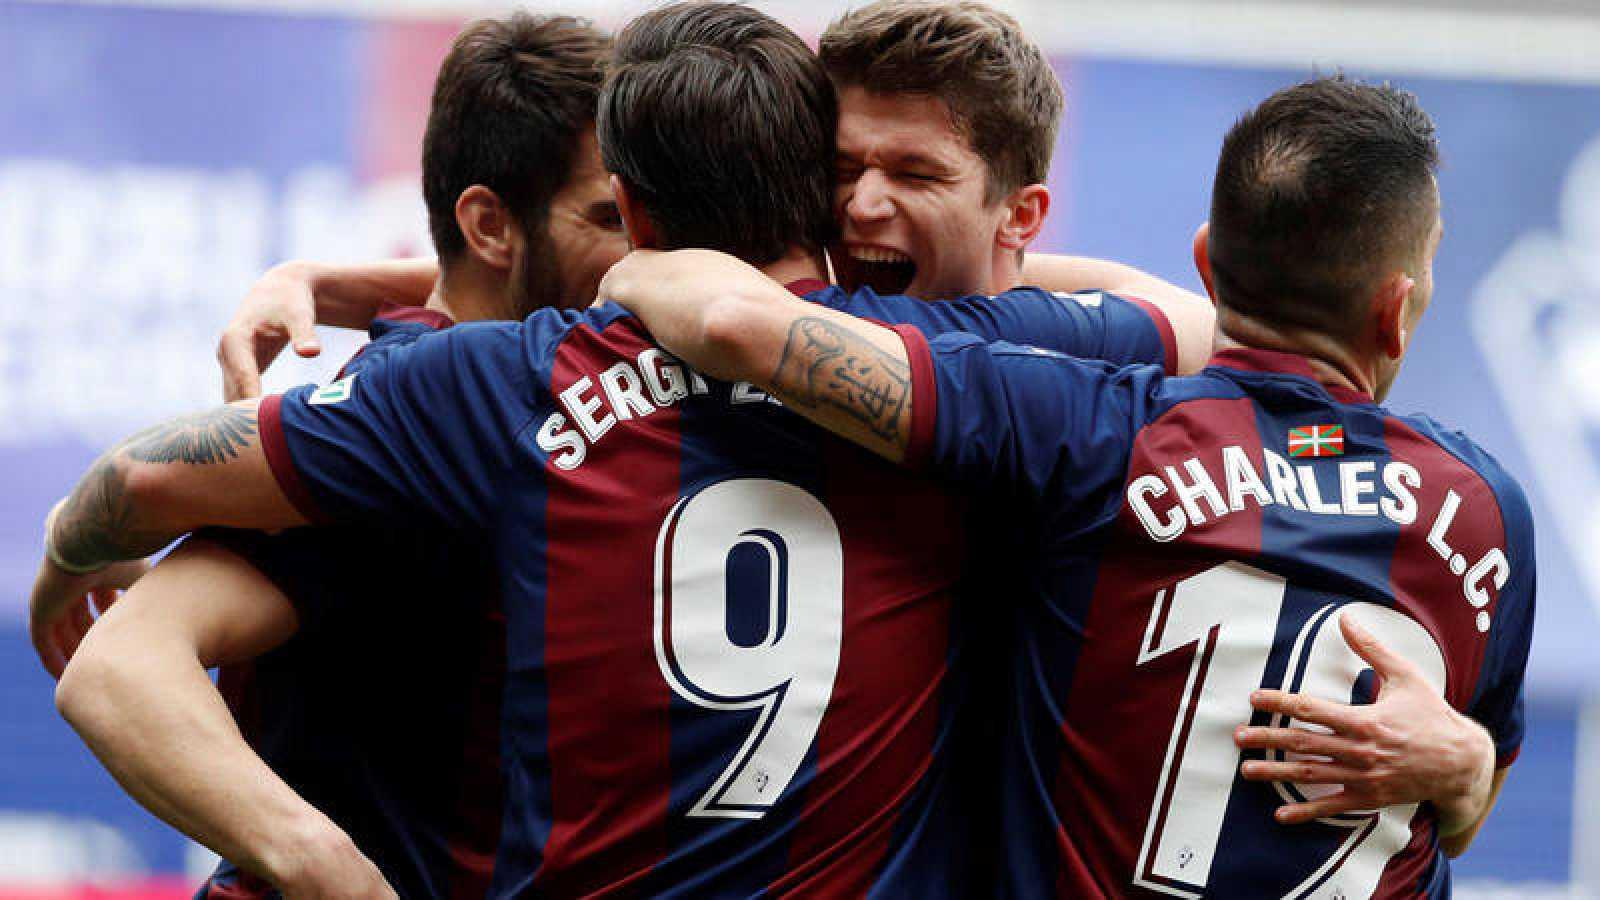 Jugadores del Eibar celebran un gol